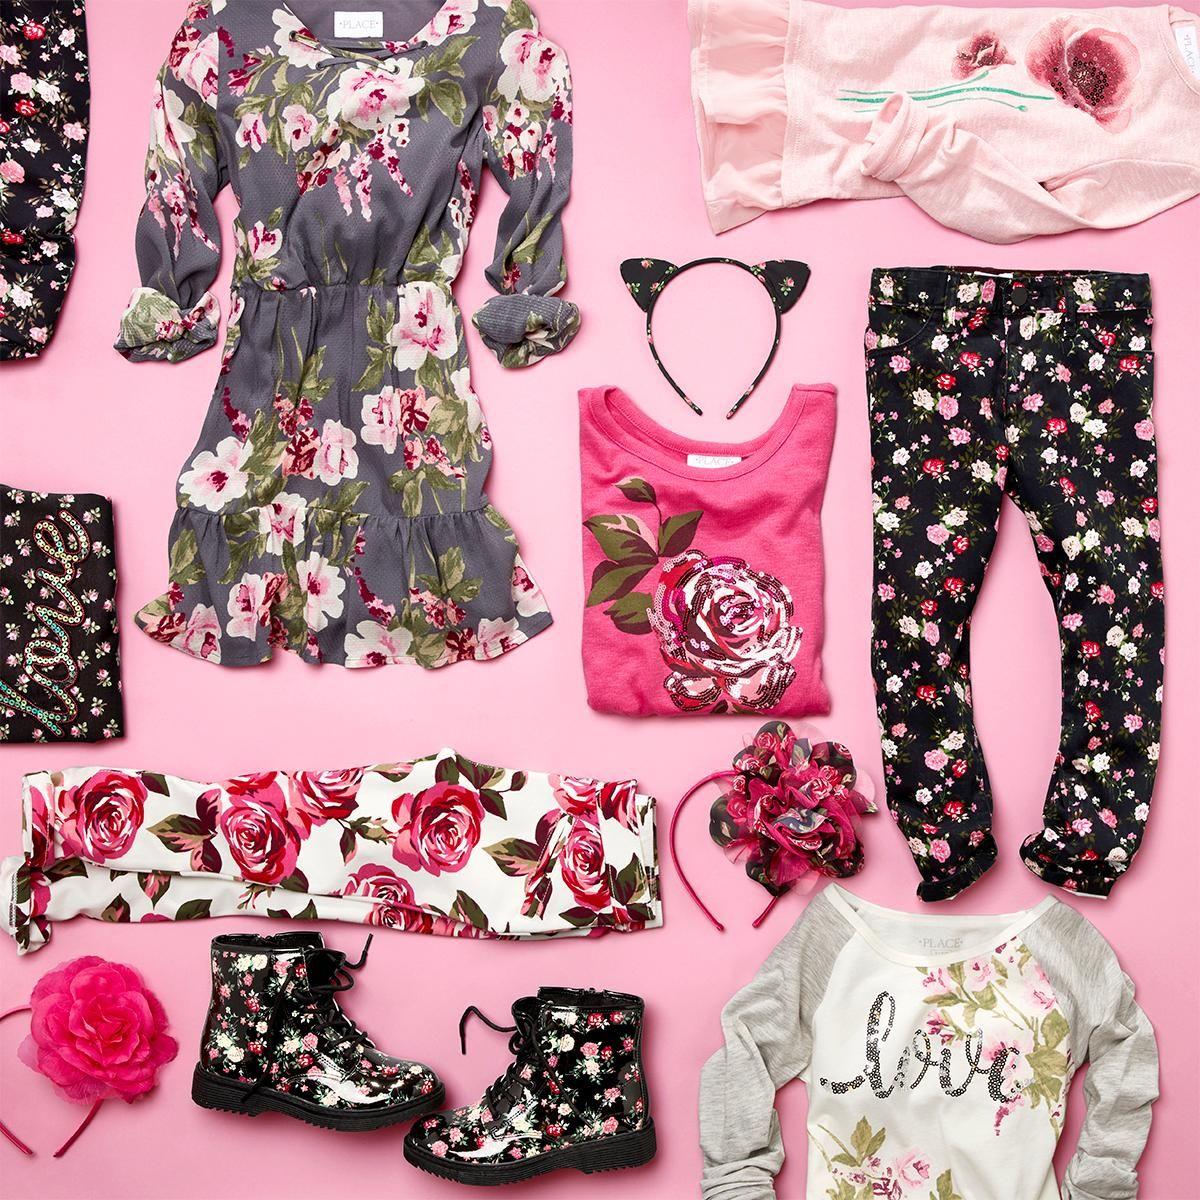 b37b42275e Girls' fashion | Kids' clothes | Floral print | Top | Dress ...